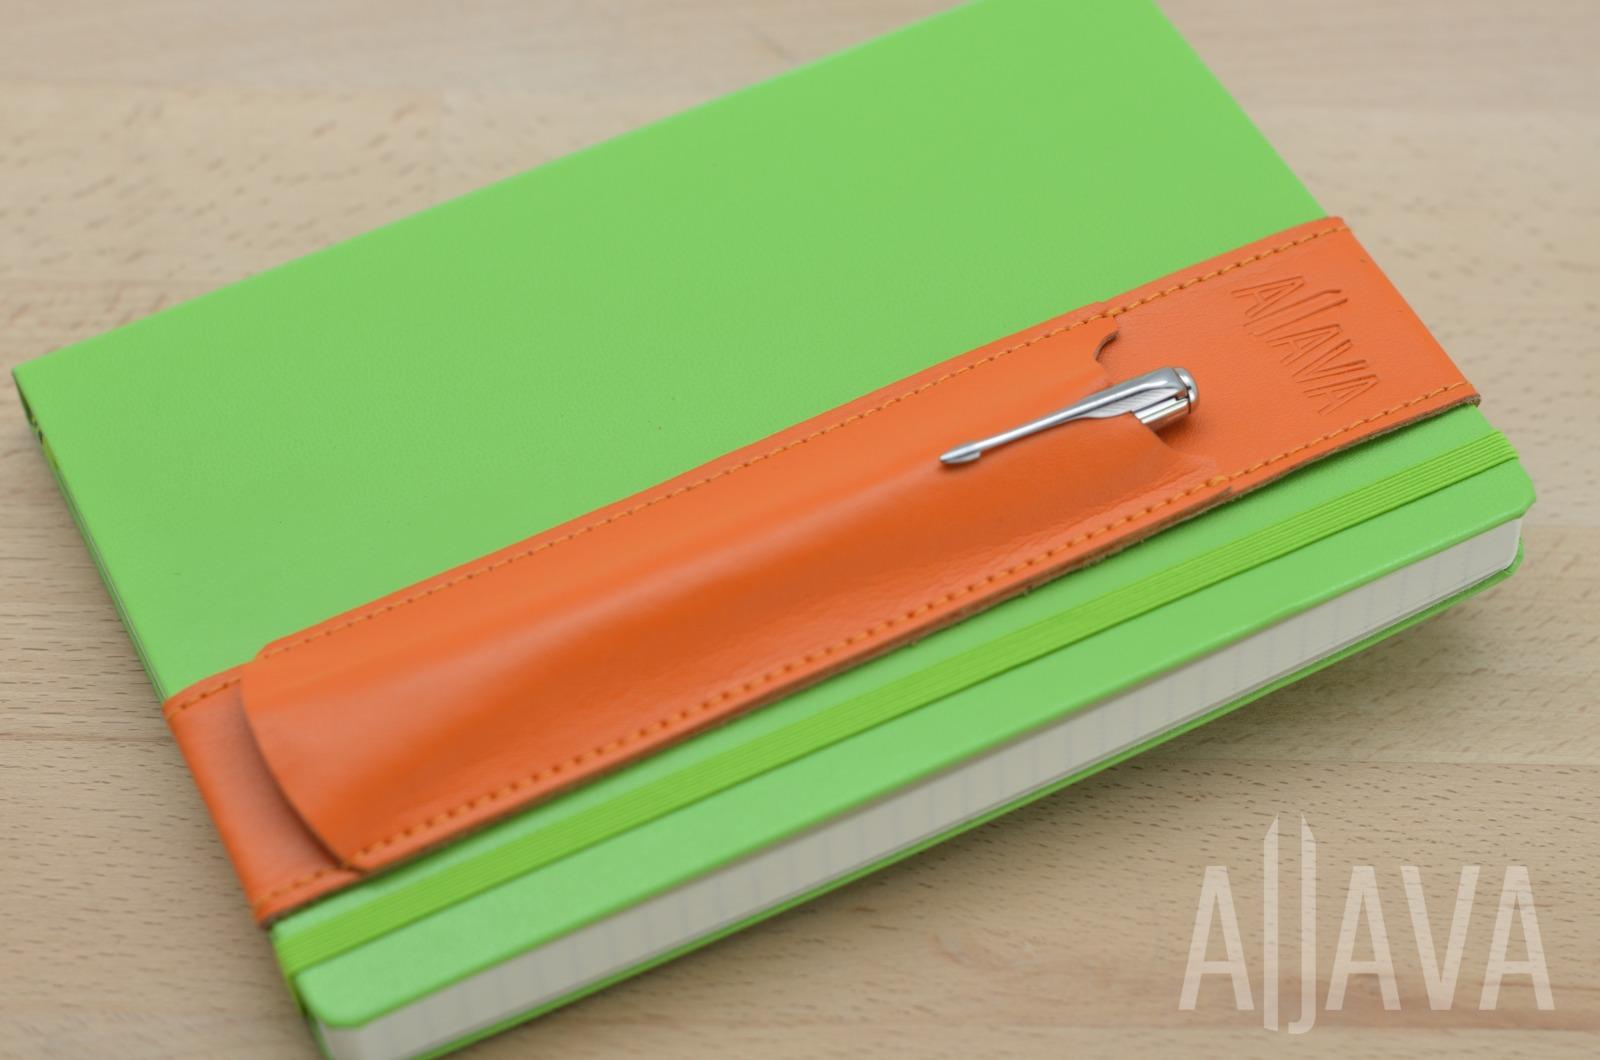 ALjAVA Louis Rindspaltleder: Orange, Naht: Orange - 4